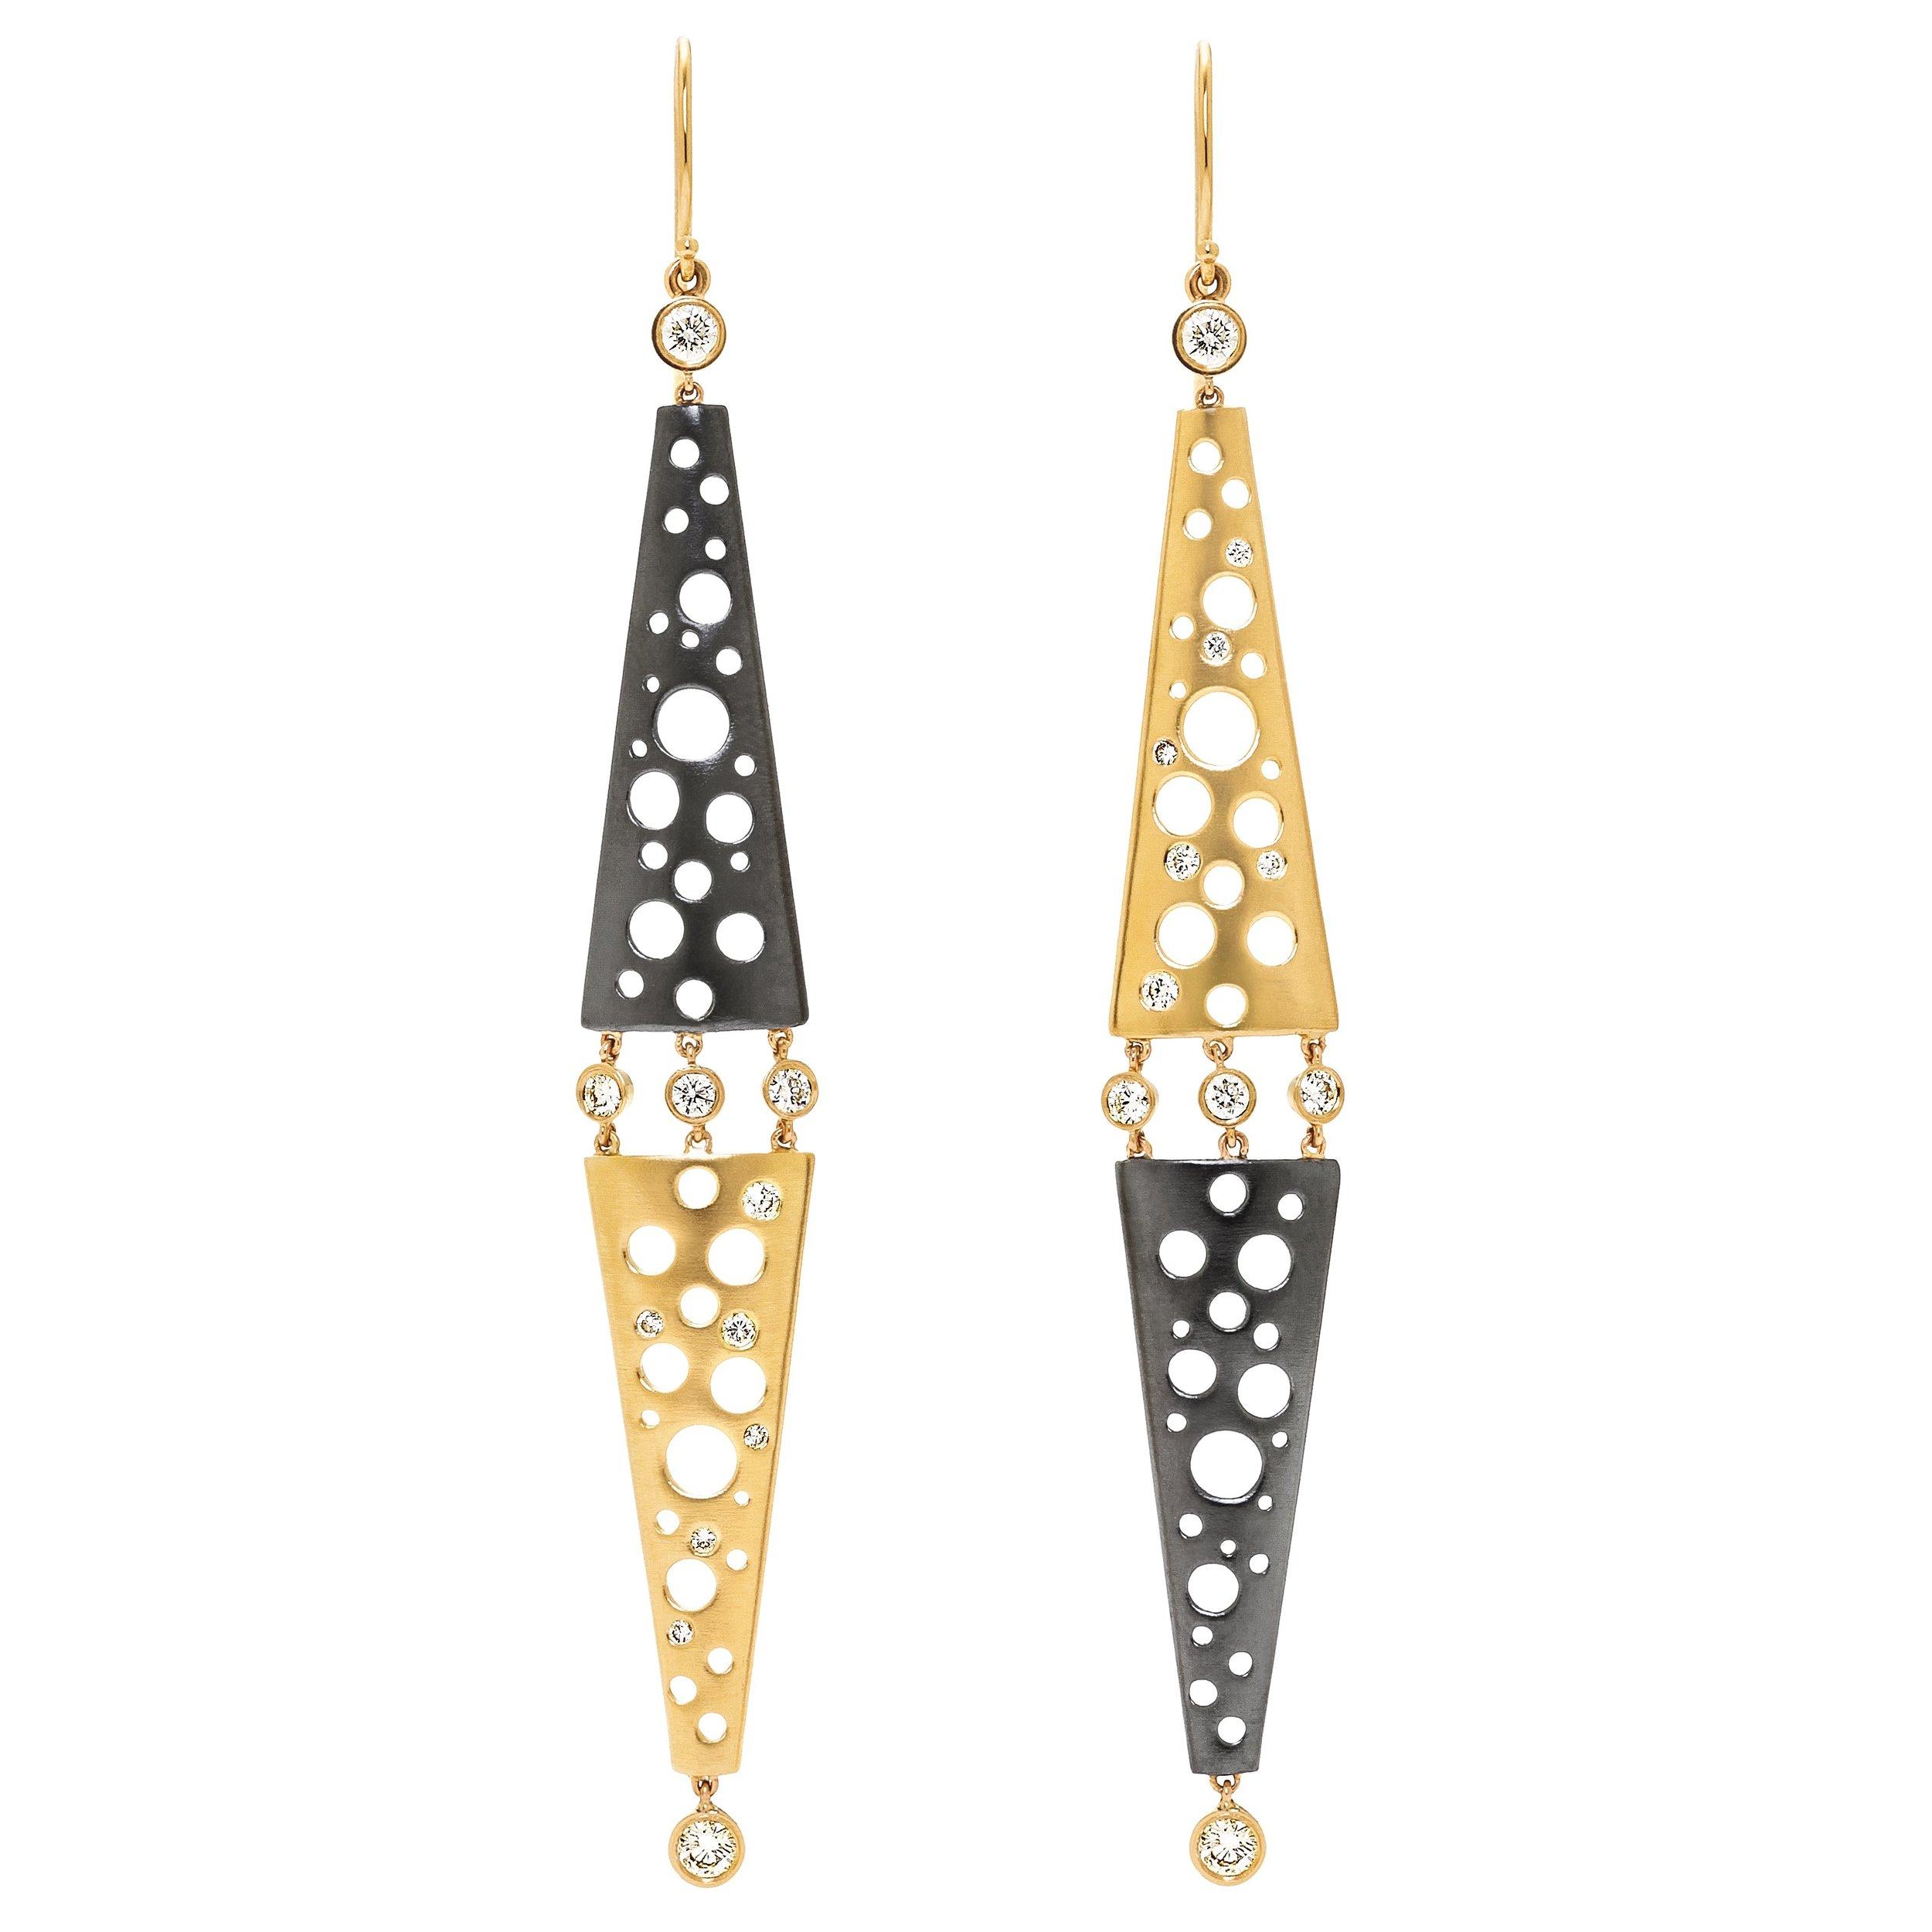 EARRING_Diamonds_Dropping_On_Helena_Mirroring_Earrings.jpg